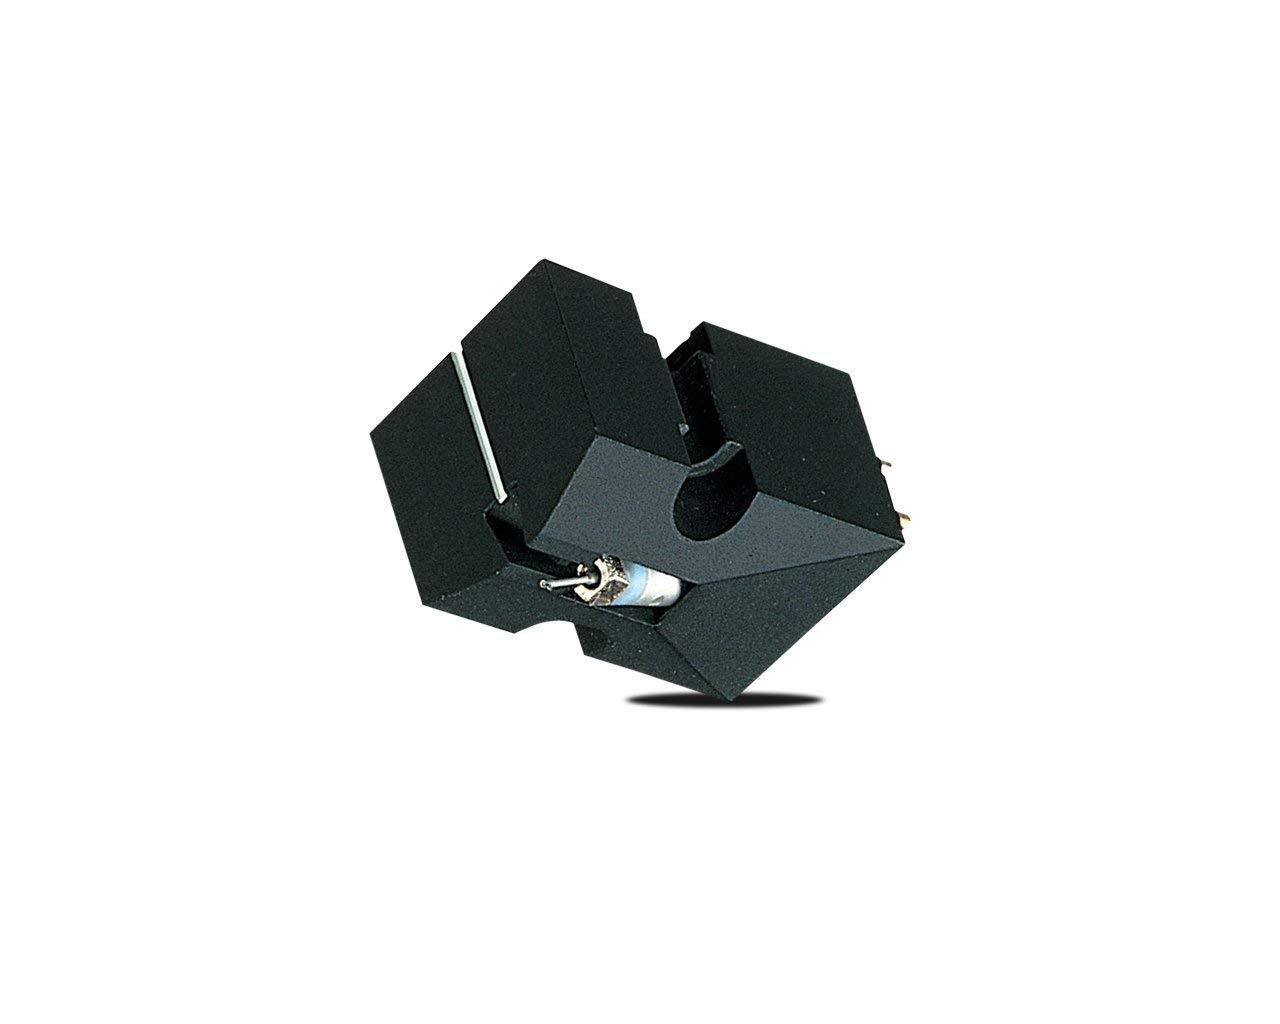 Denon Moving Coil Cartridge